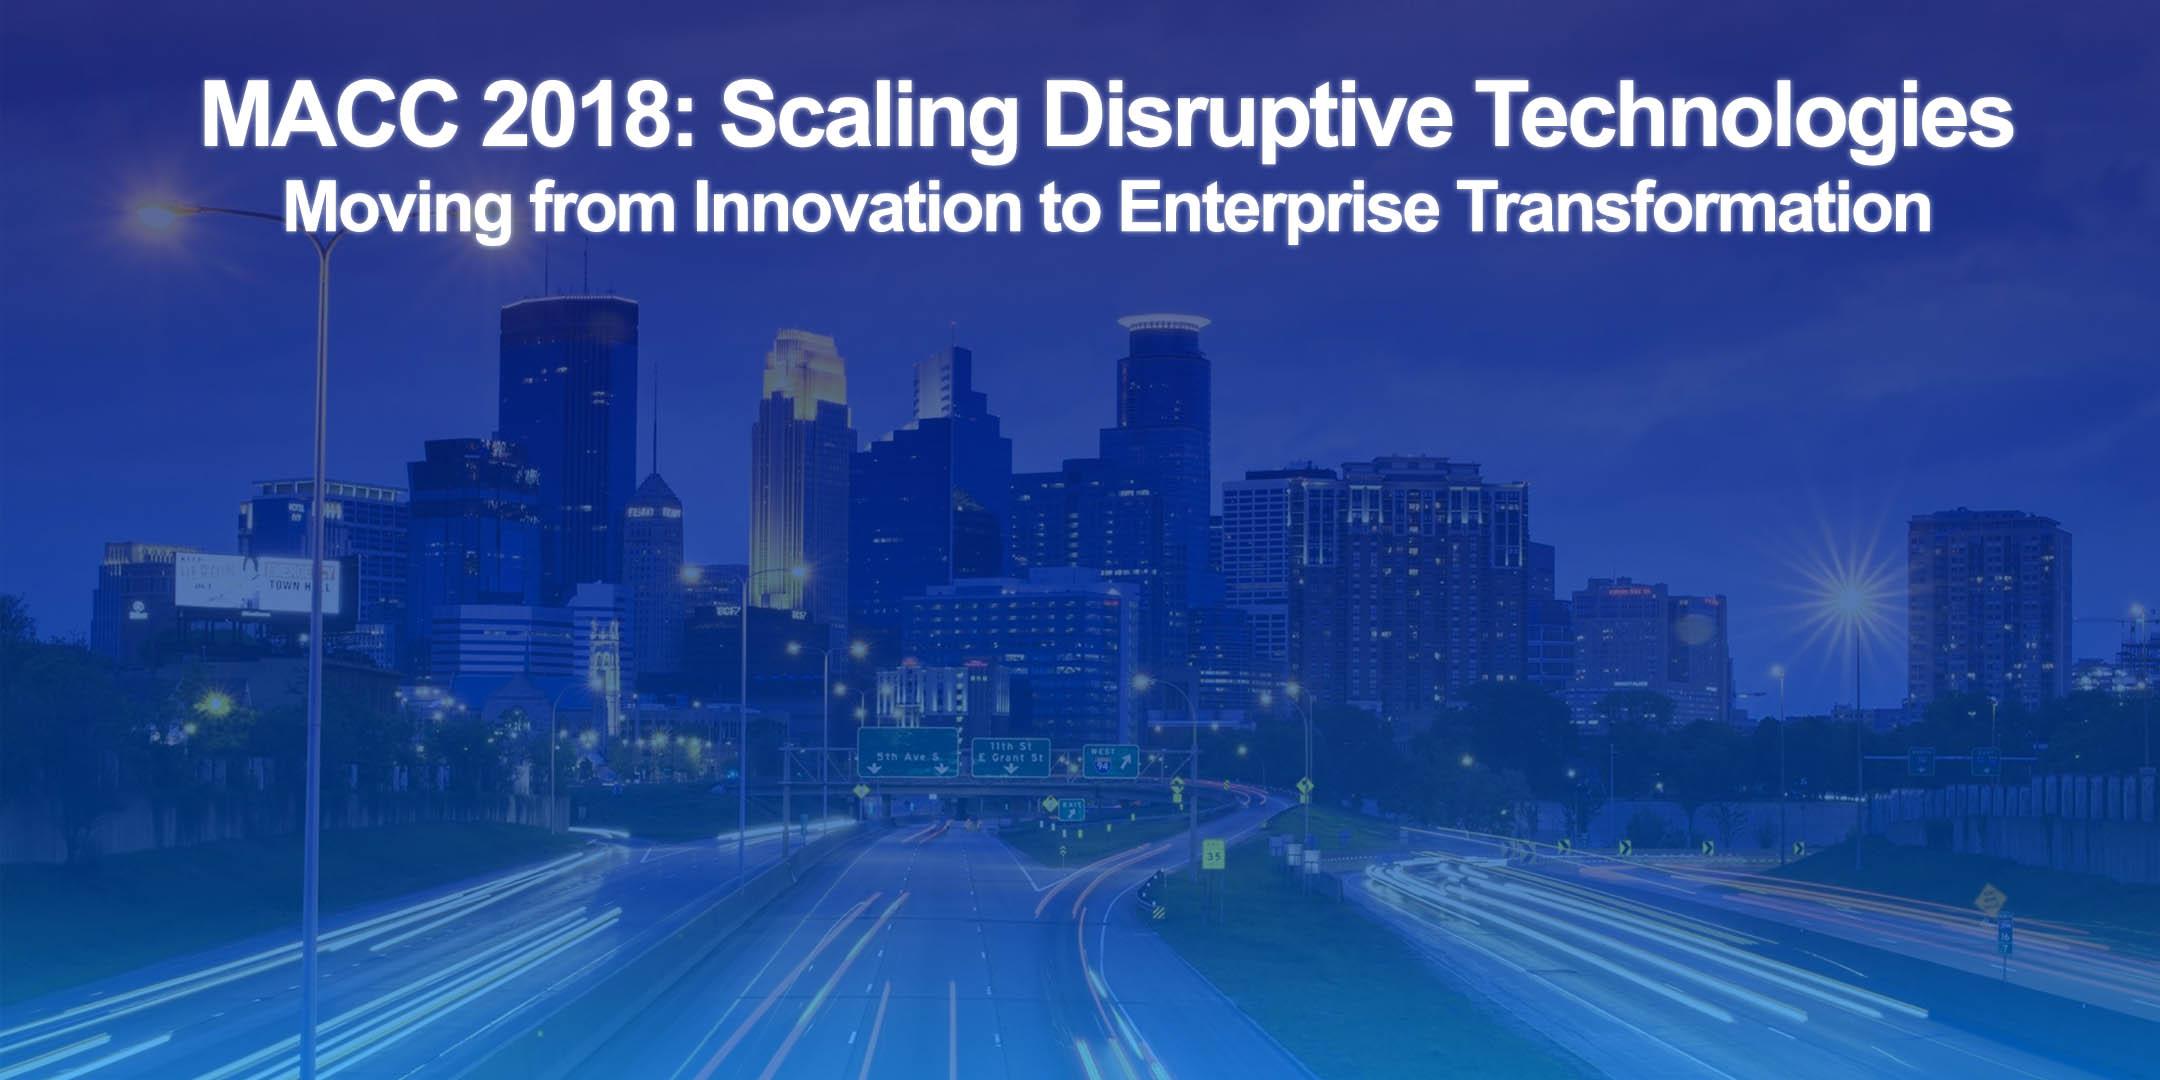 MACC 2018: Scaling Disruptive Technologies